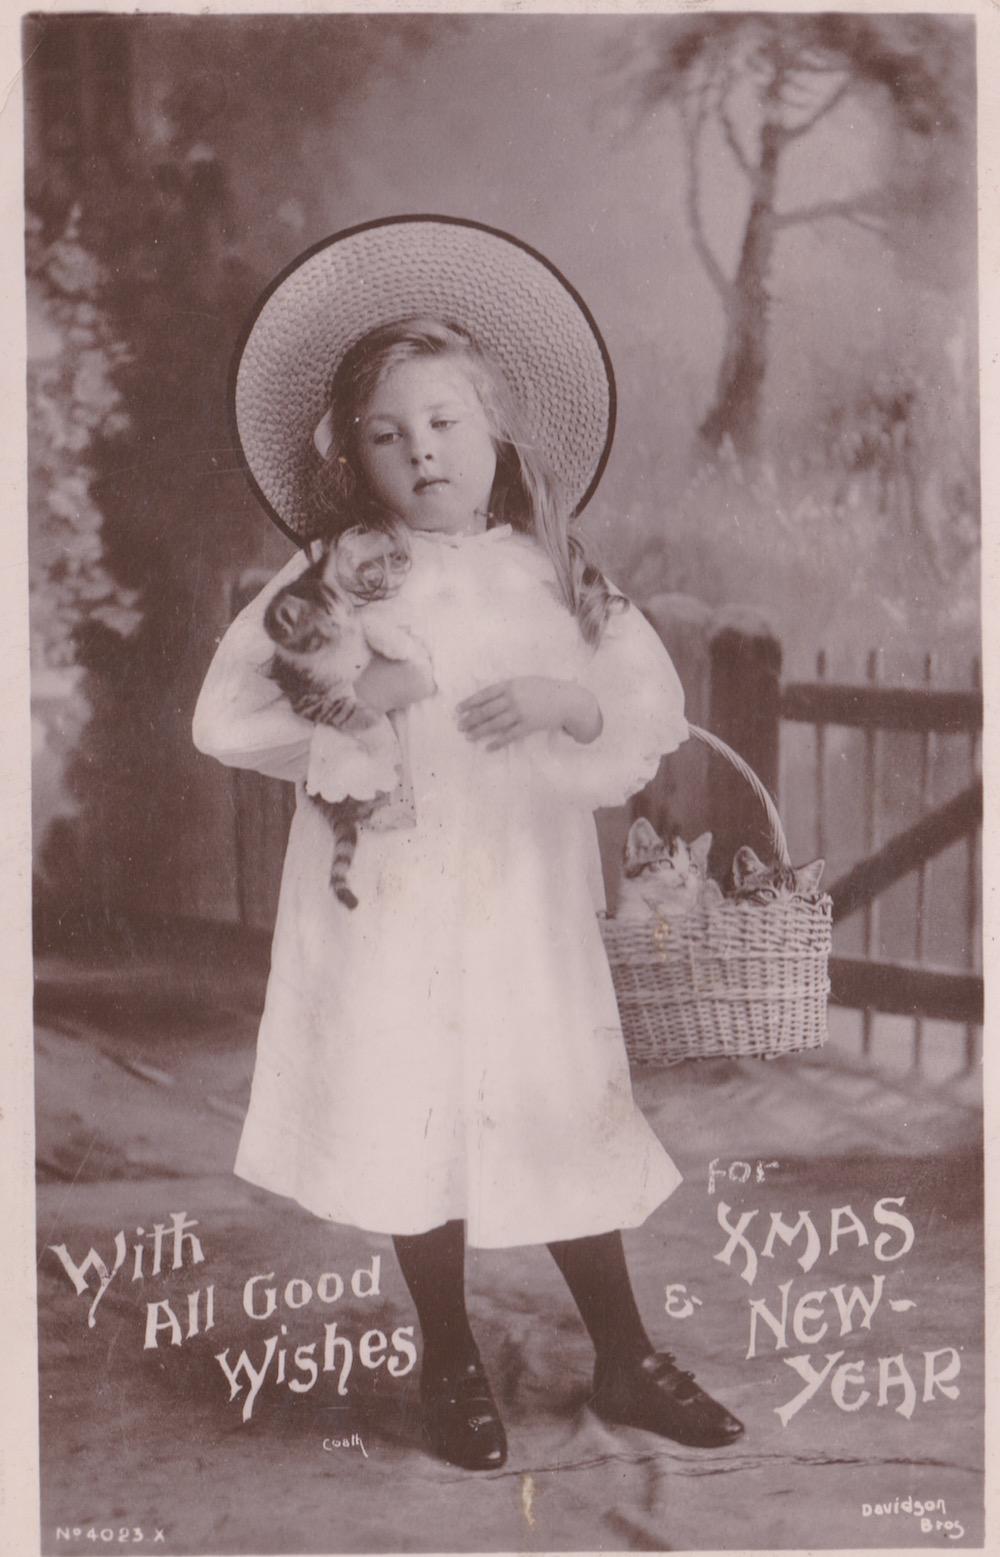 Davidson Bros 'Real Photographic' series Dec 1906 wishing Mrs Harding a merry xmas